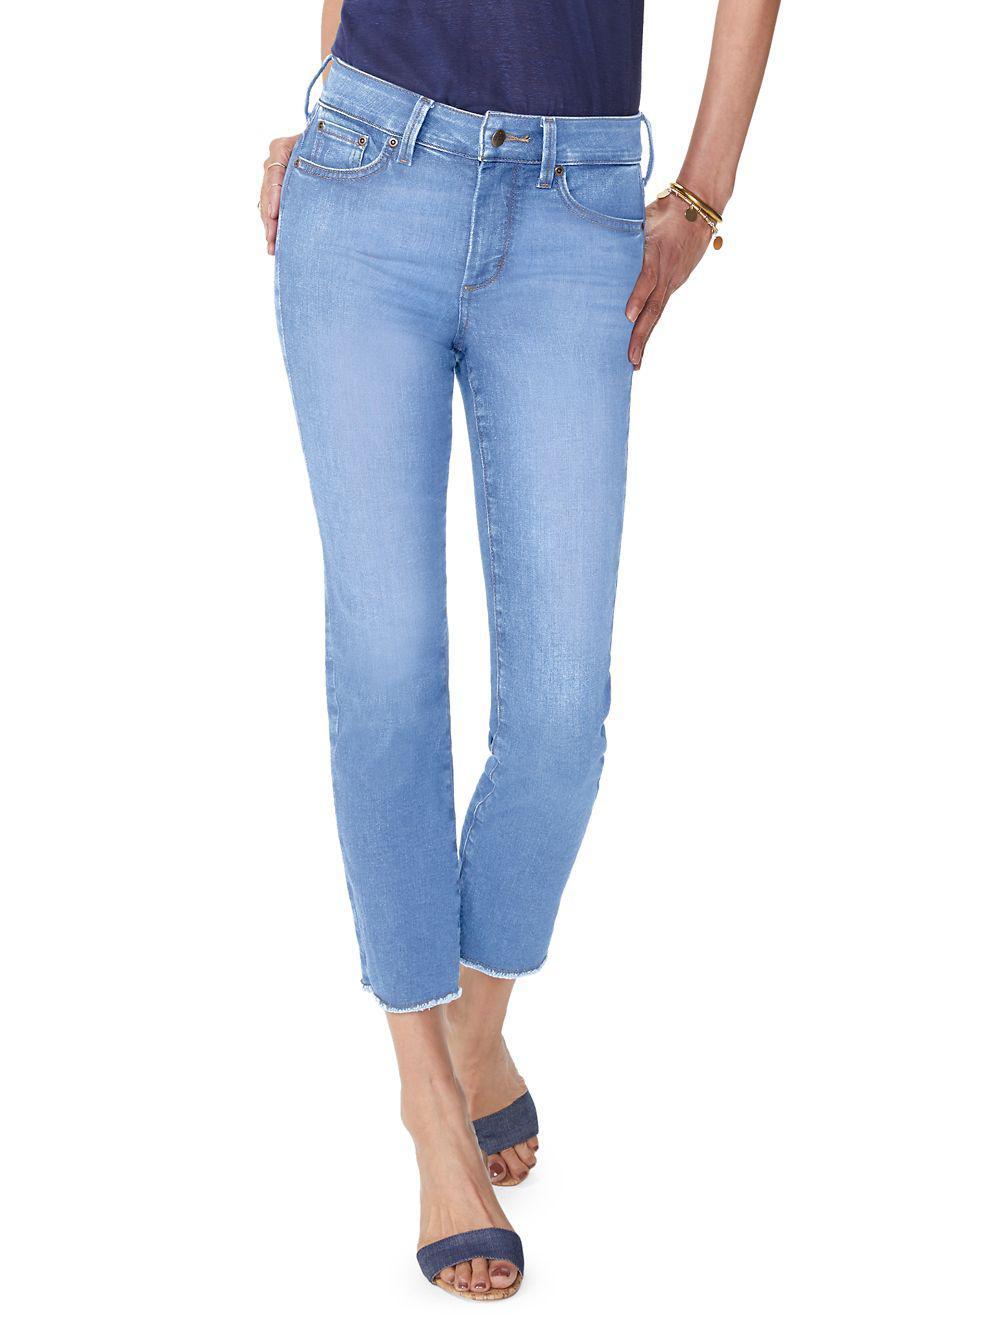 b9b52192c6 Lyst - Nydj Petite Sheri Ankle Jeans in Blue